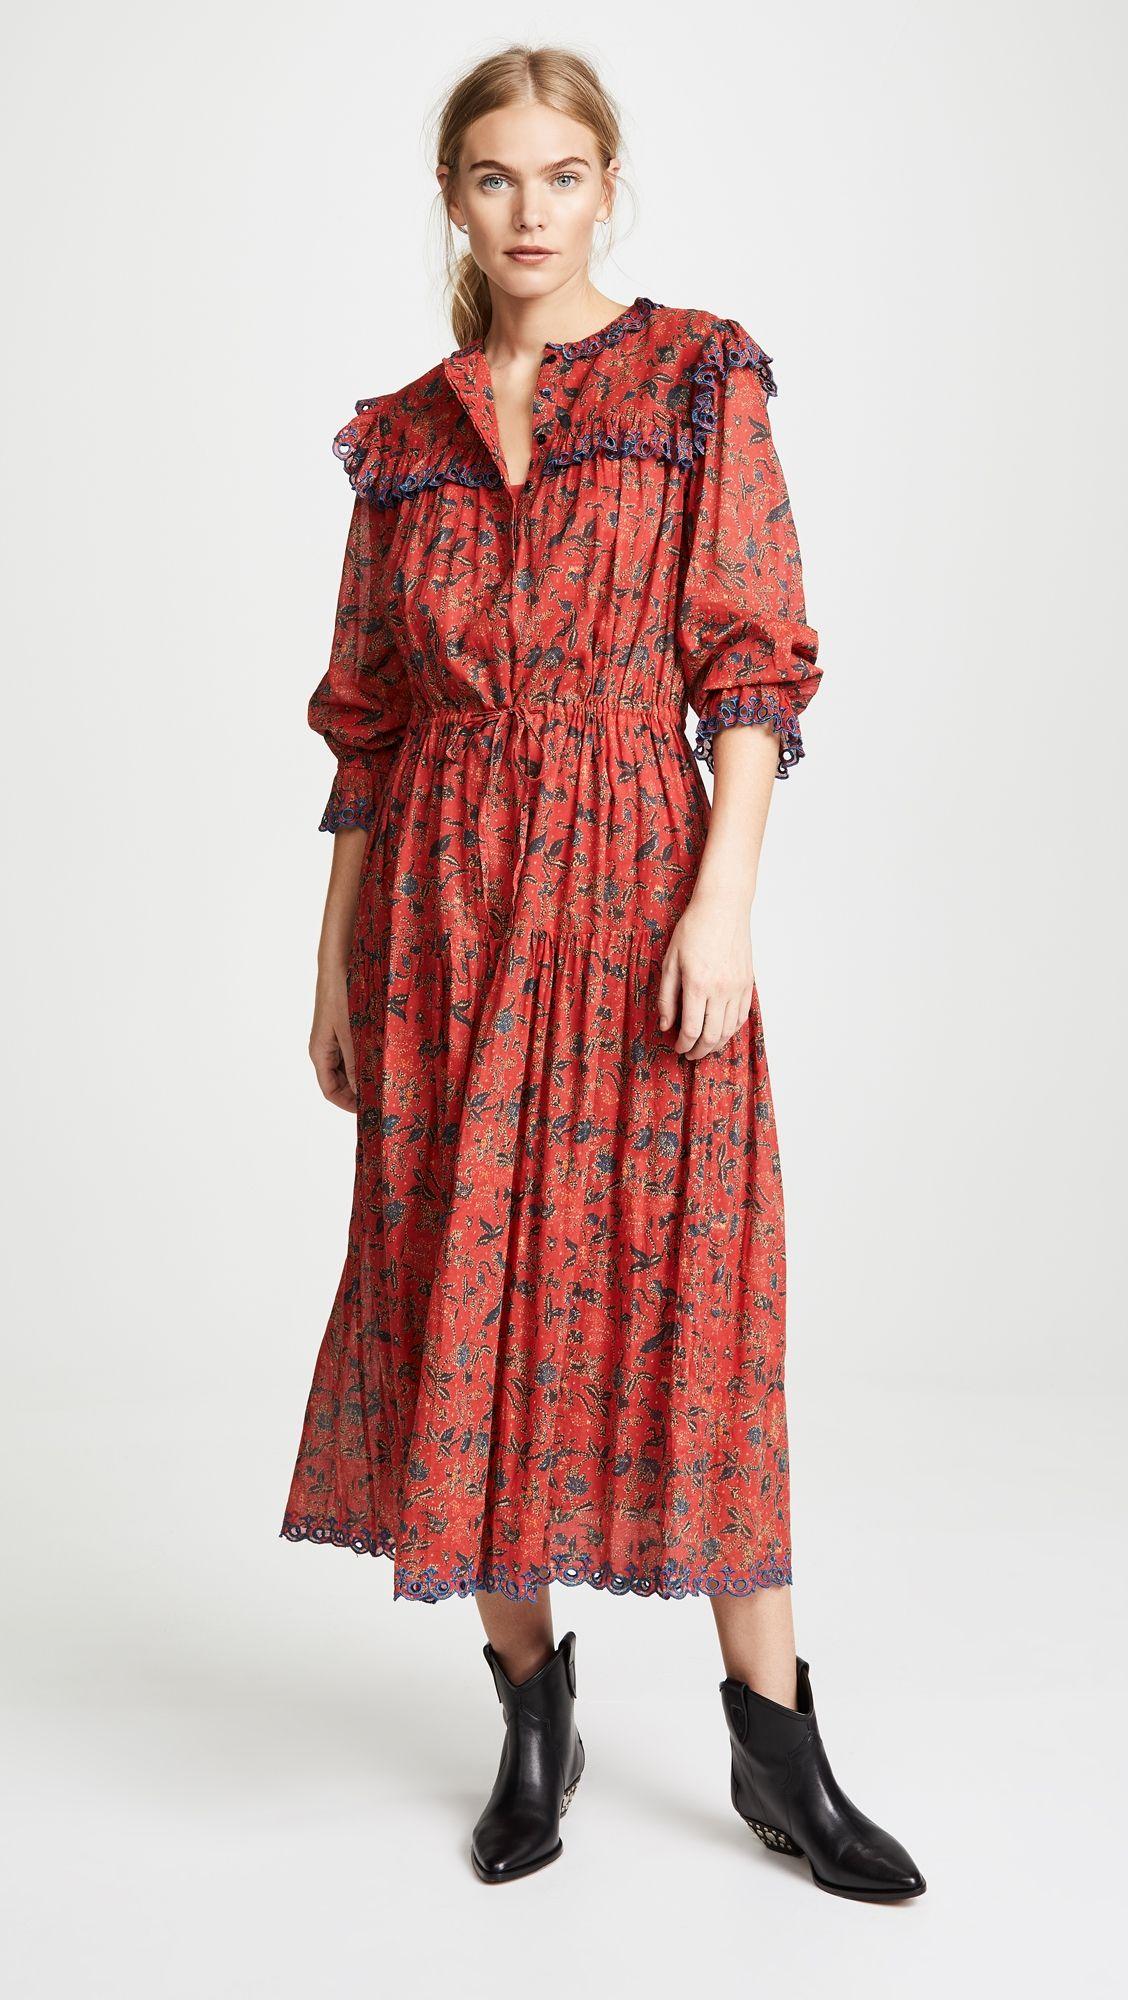 2018 Isabel Products Marant Dresses Eina Dress In Pinterest TS4qwnFEBx